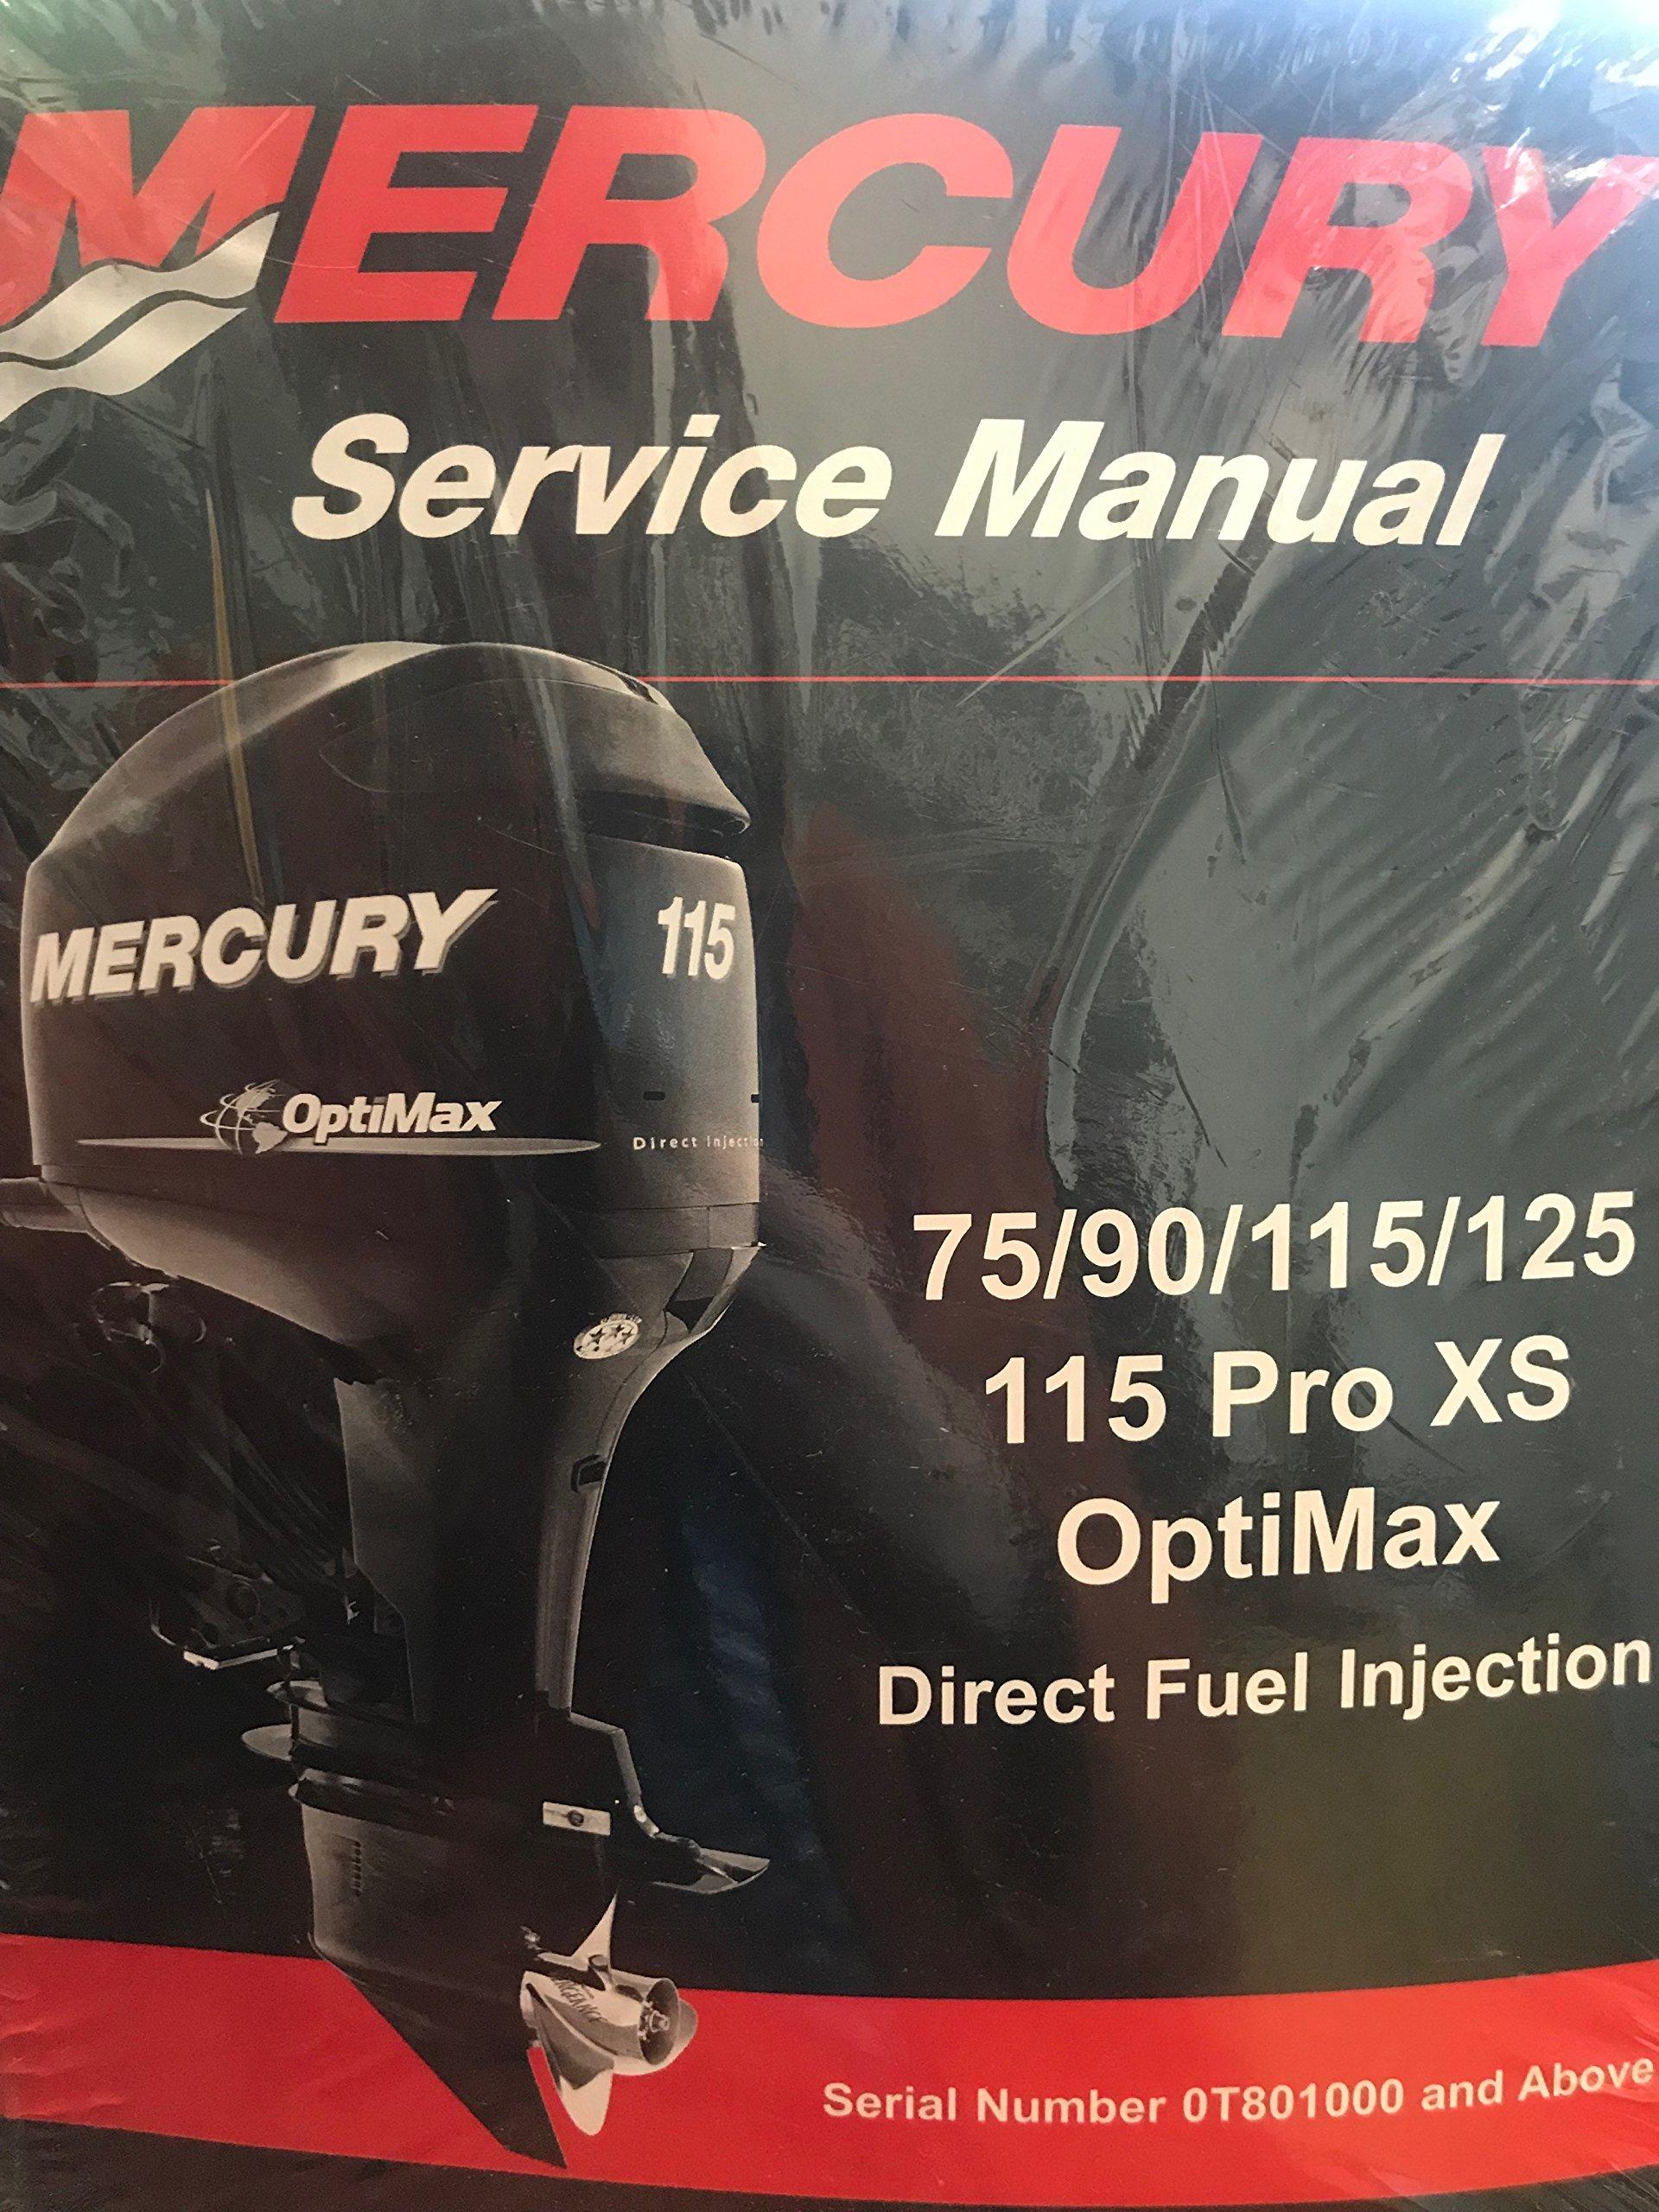 Mercury Service Manual 75/90/115/125 1115 Pro XS OptiMax Direct Fuel  Injection: Mercury: Amazon.com: Books